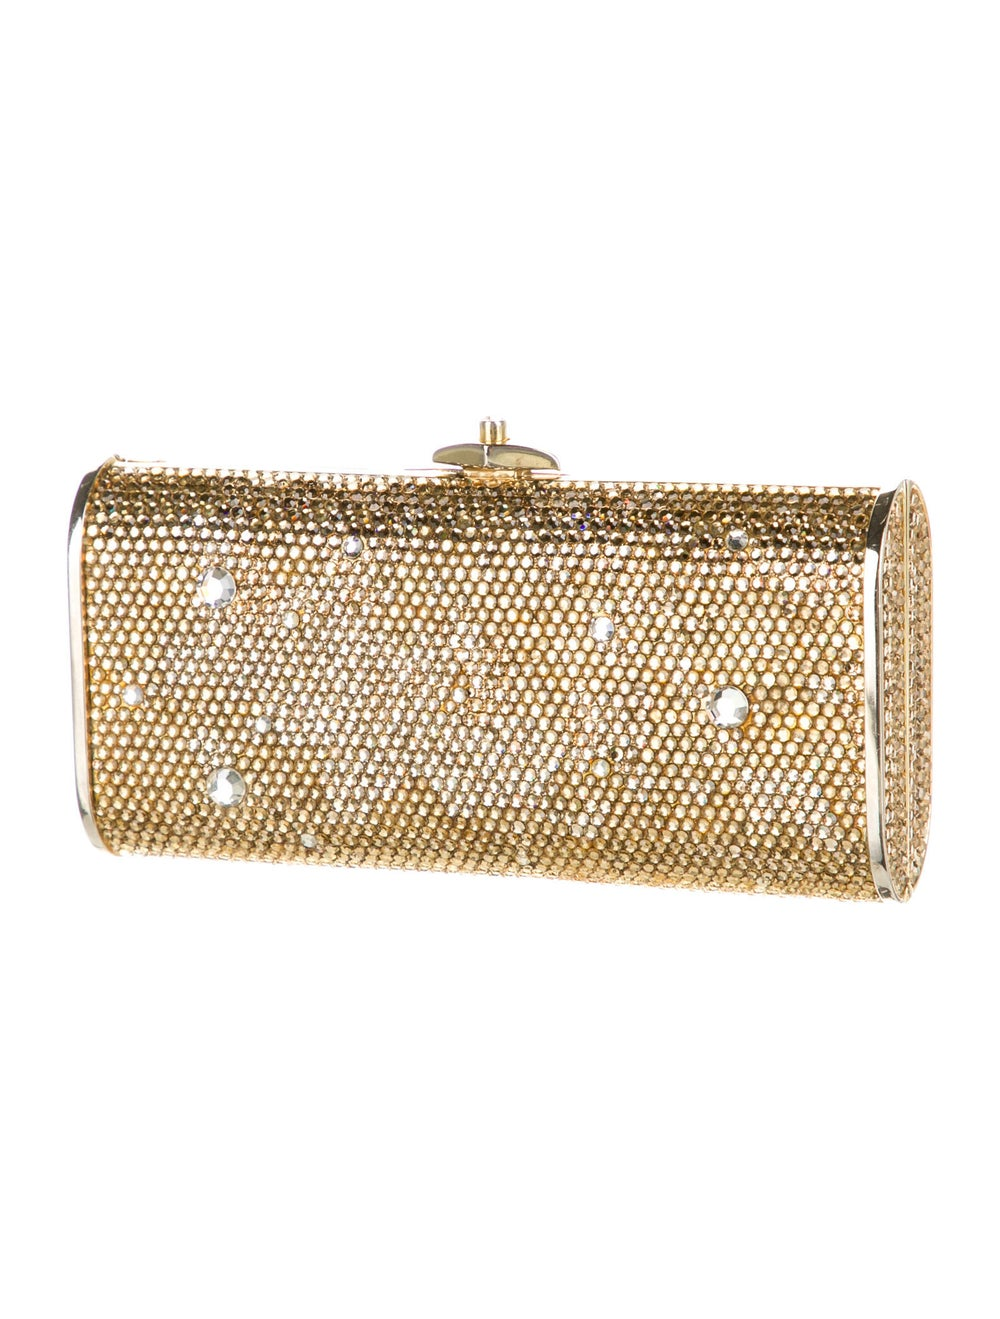 Judith Leiber Crystal Embellished Box Clutch Gold - image 3